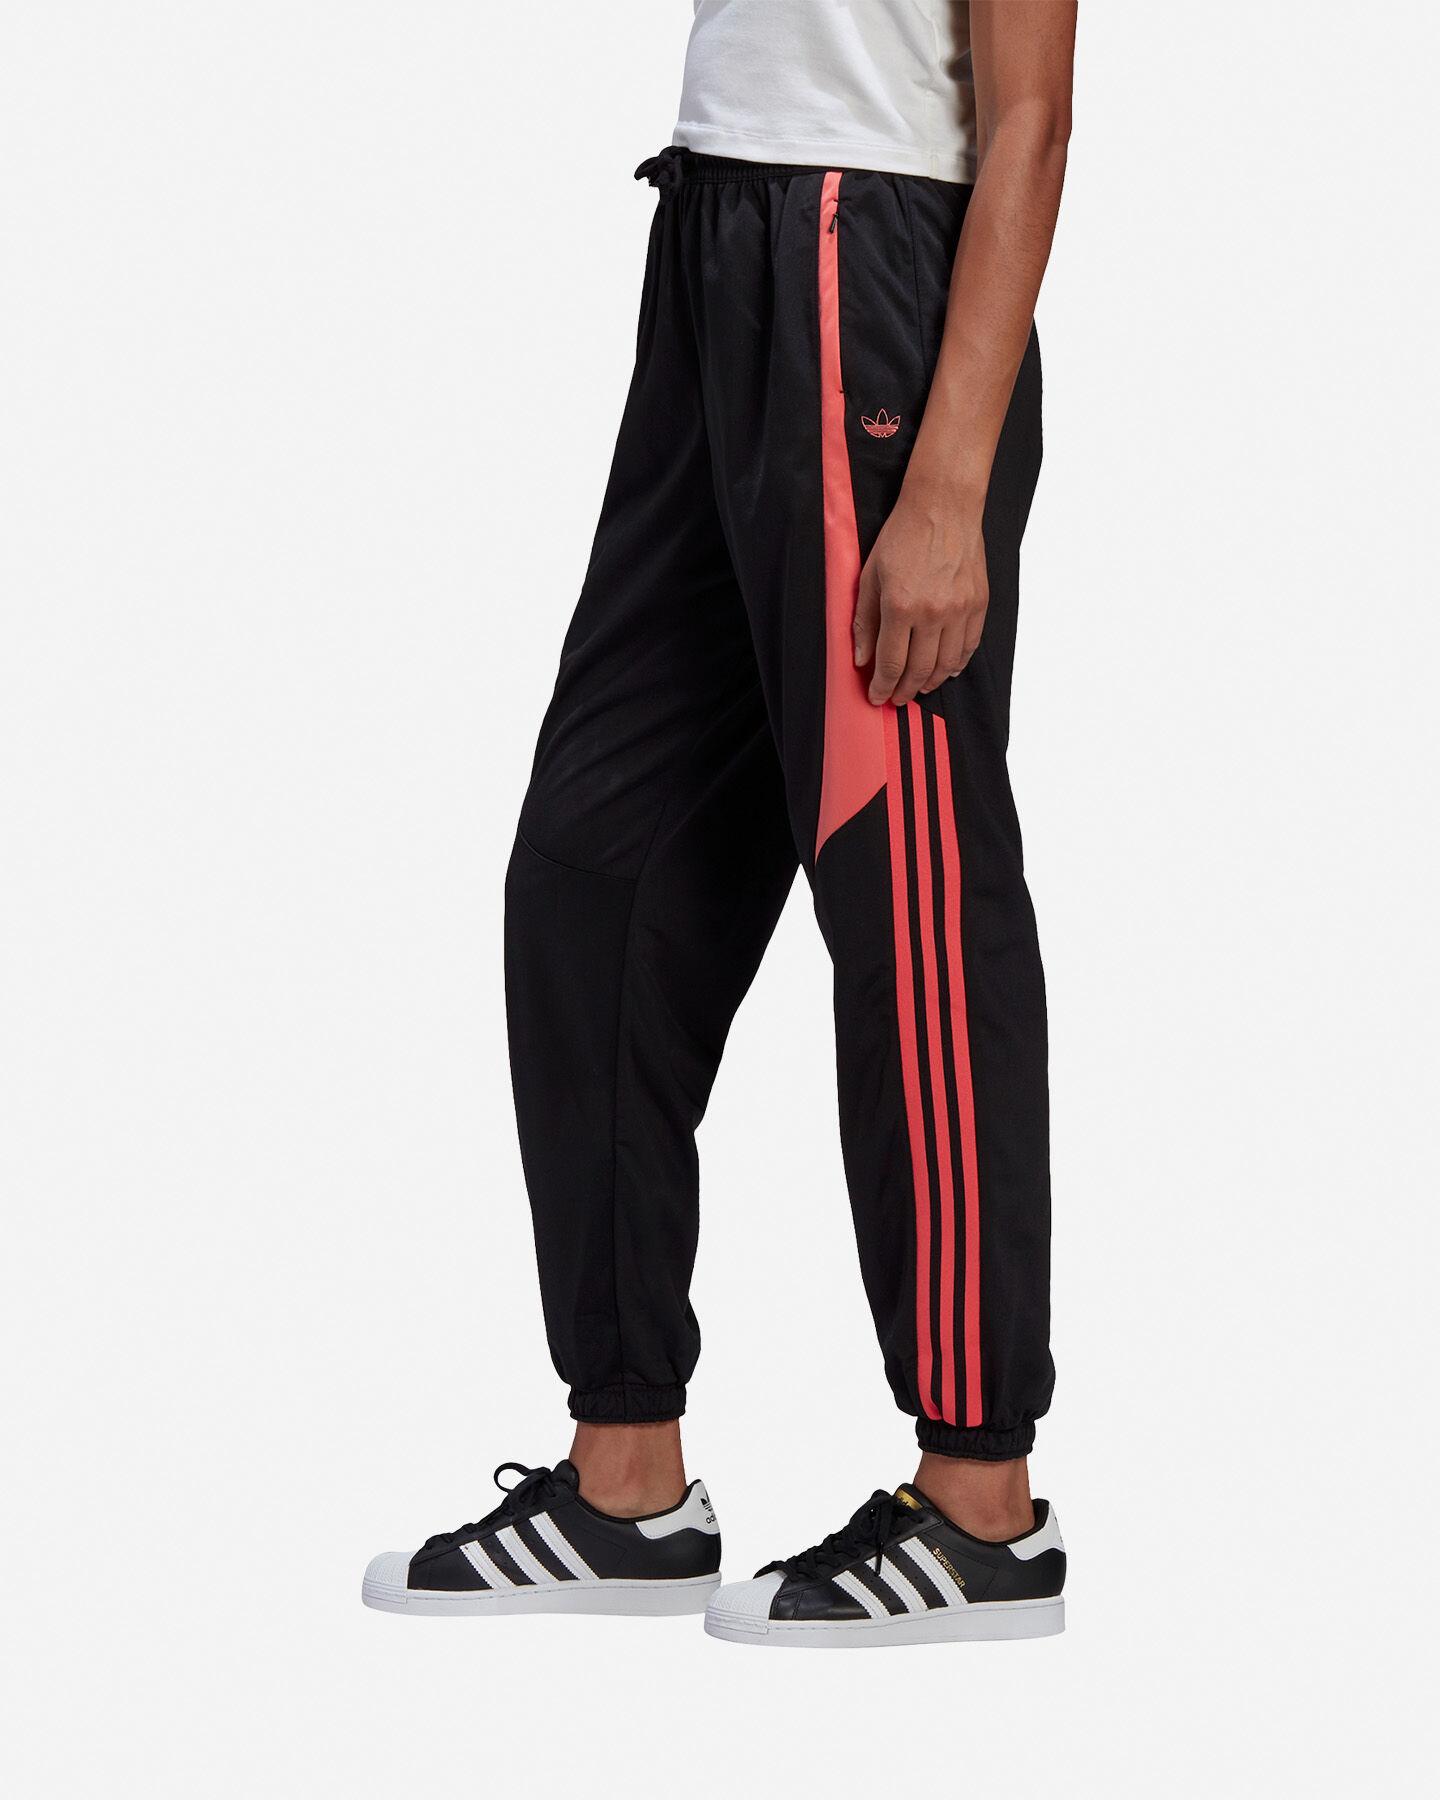 Pantalone ADIDAS ORIGINALS TRACK W S5209953 scatto 3